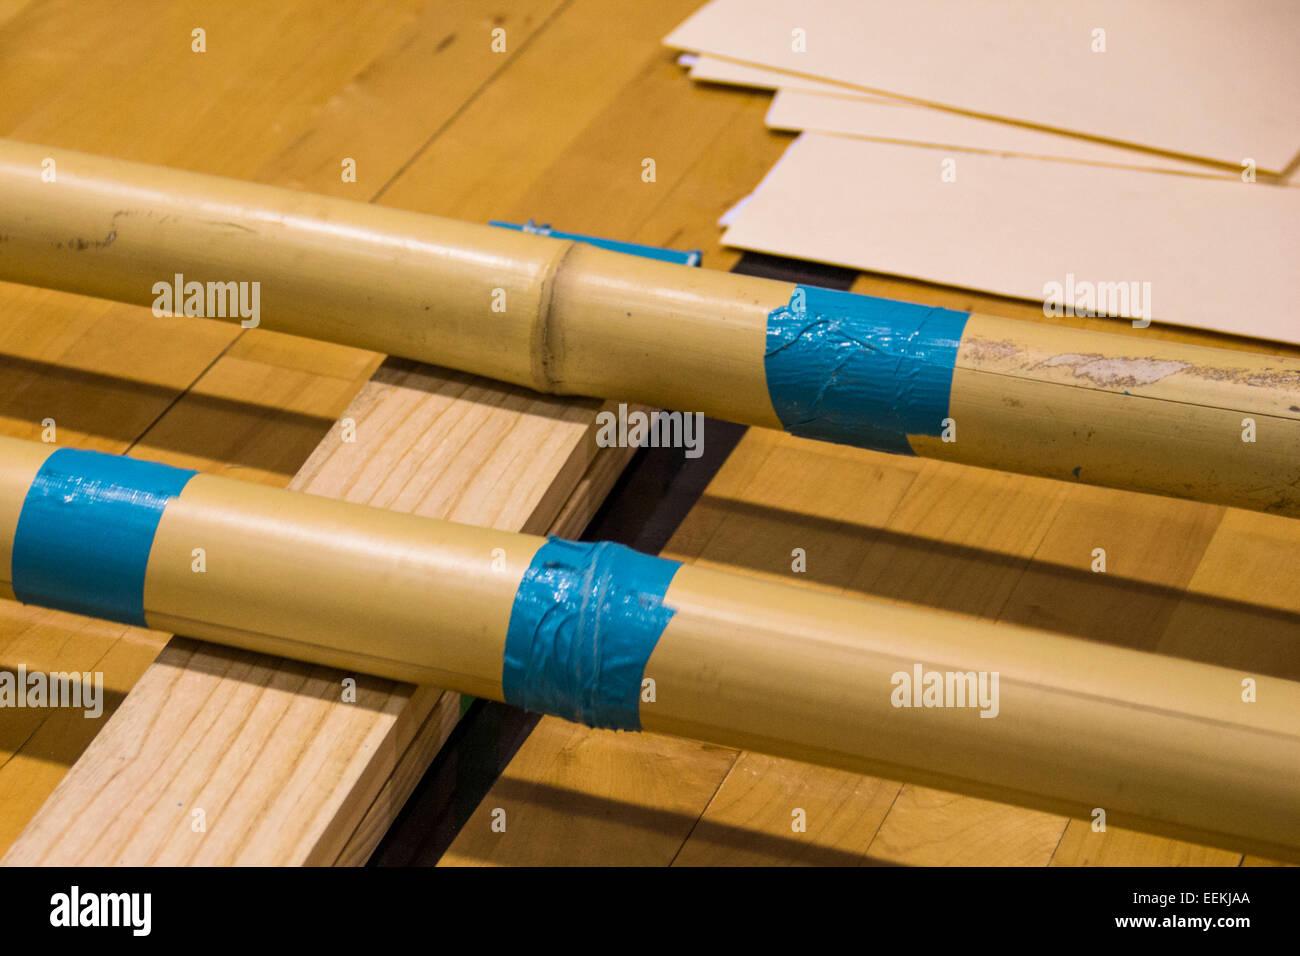 tinikling sticks